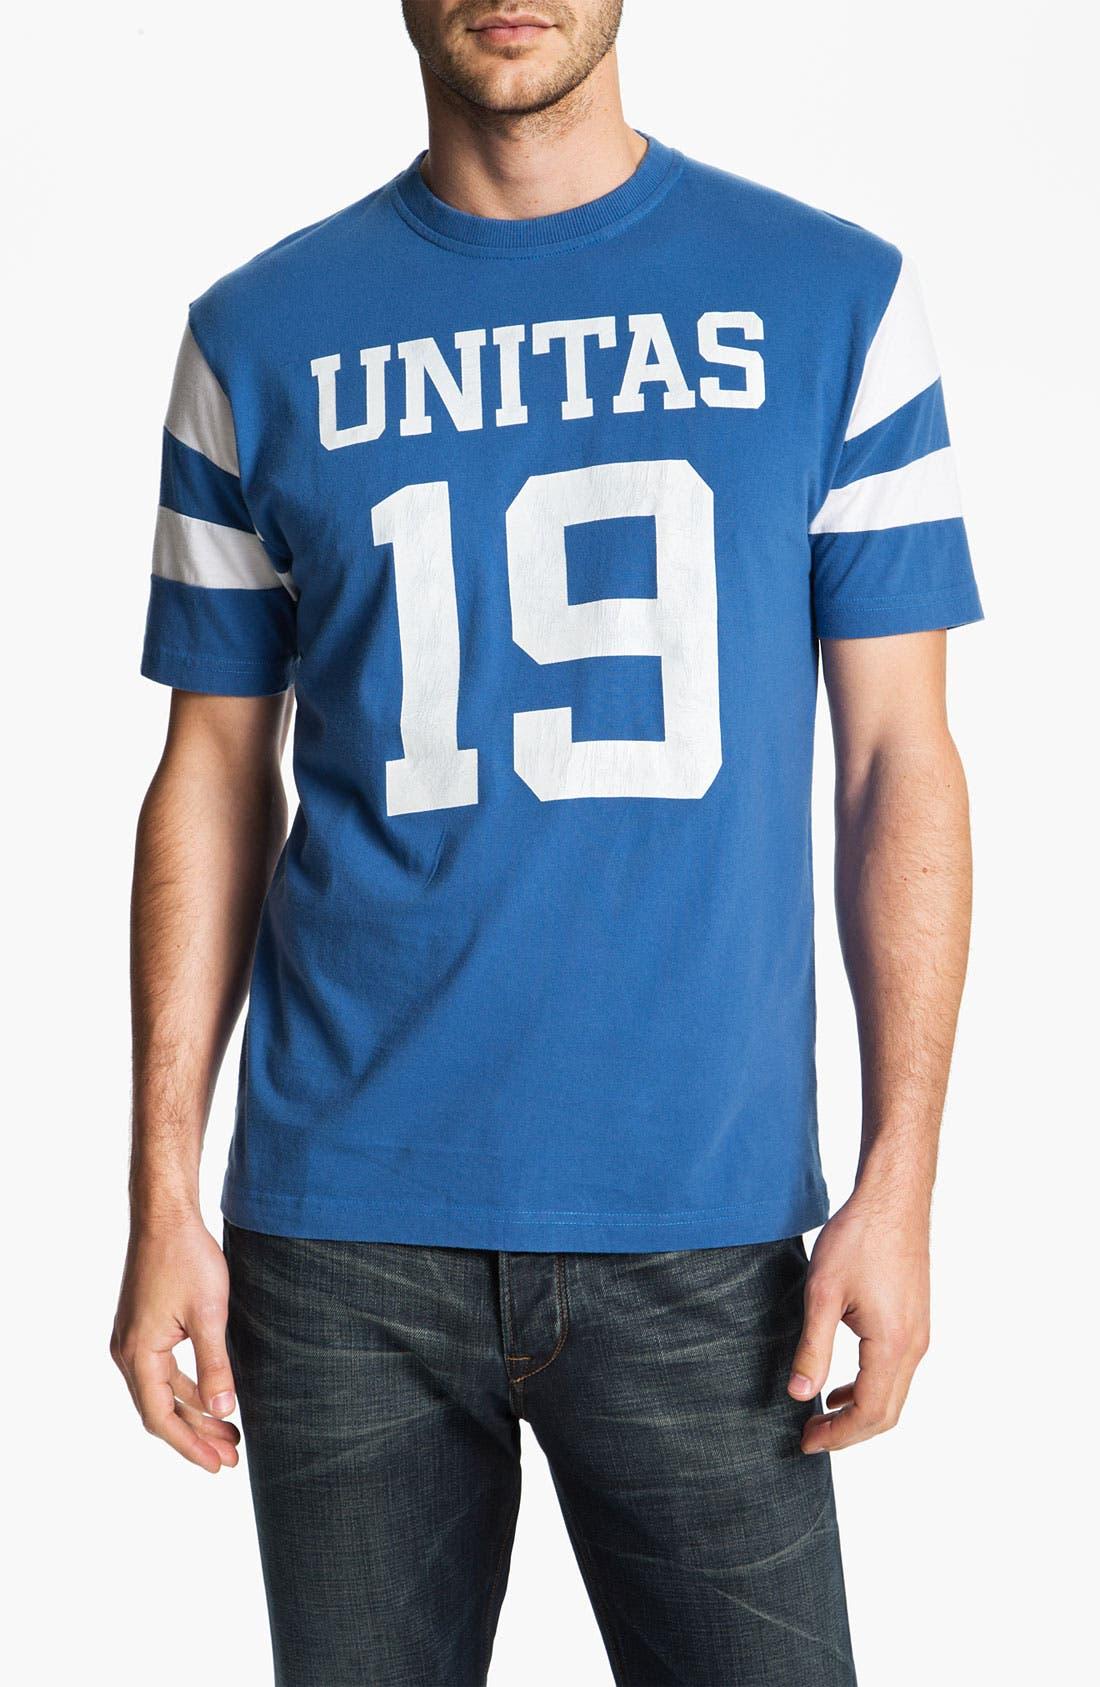 Alternate Image 1 Selected - Red Jacket 'Johnny Unitas - Nickel' T-Shirt